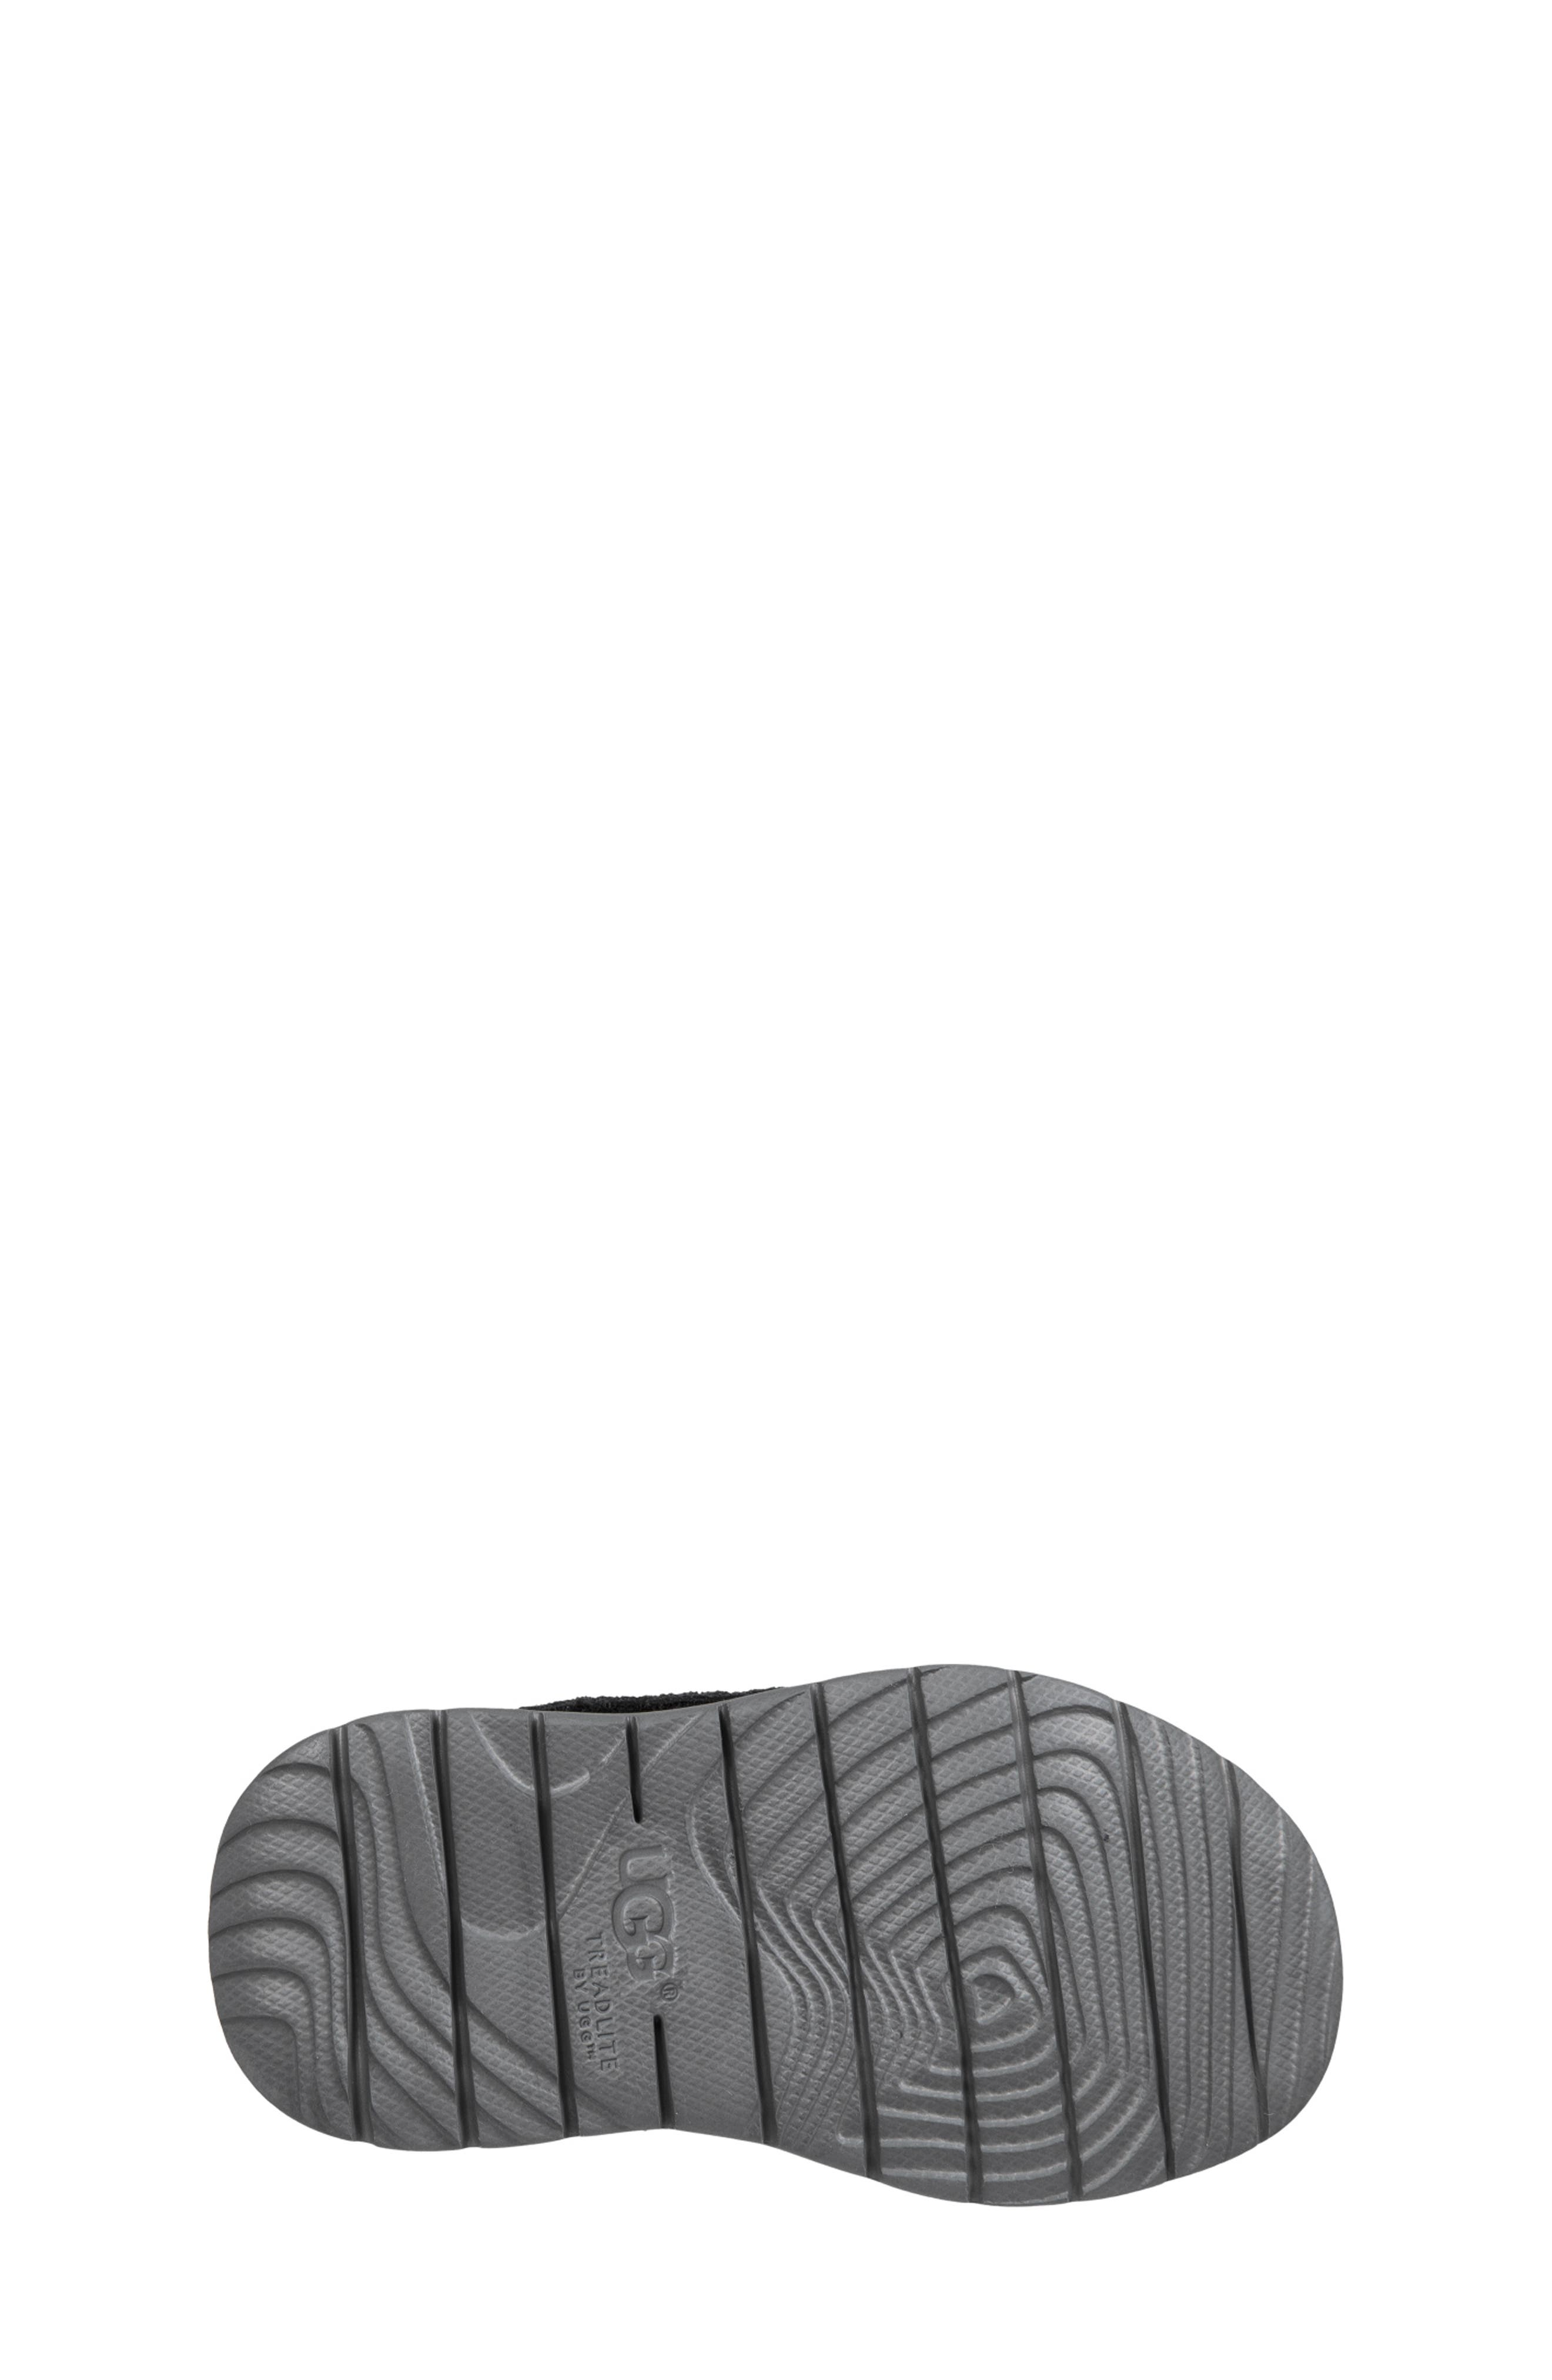 Canoe Washable Chukka Sneaker,                             Alternate thumbnail 5, color,                             BLACK